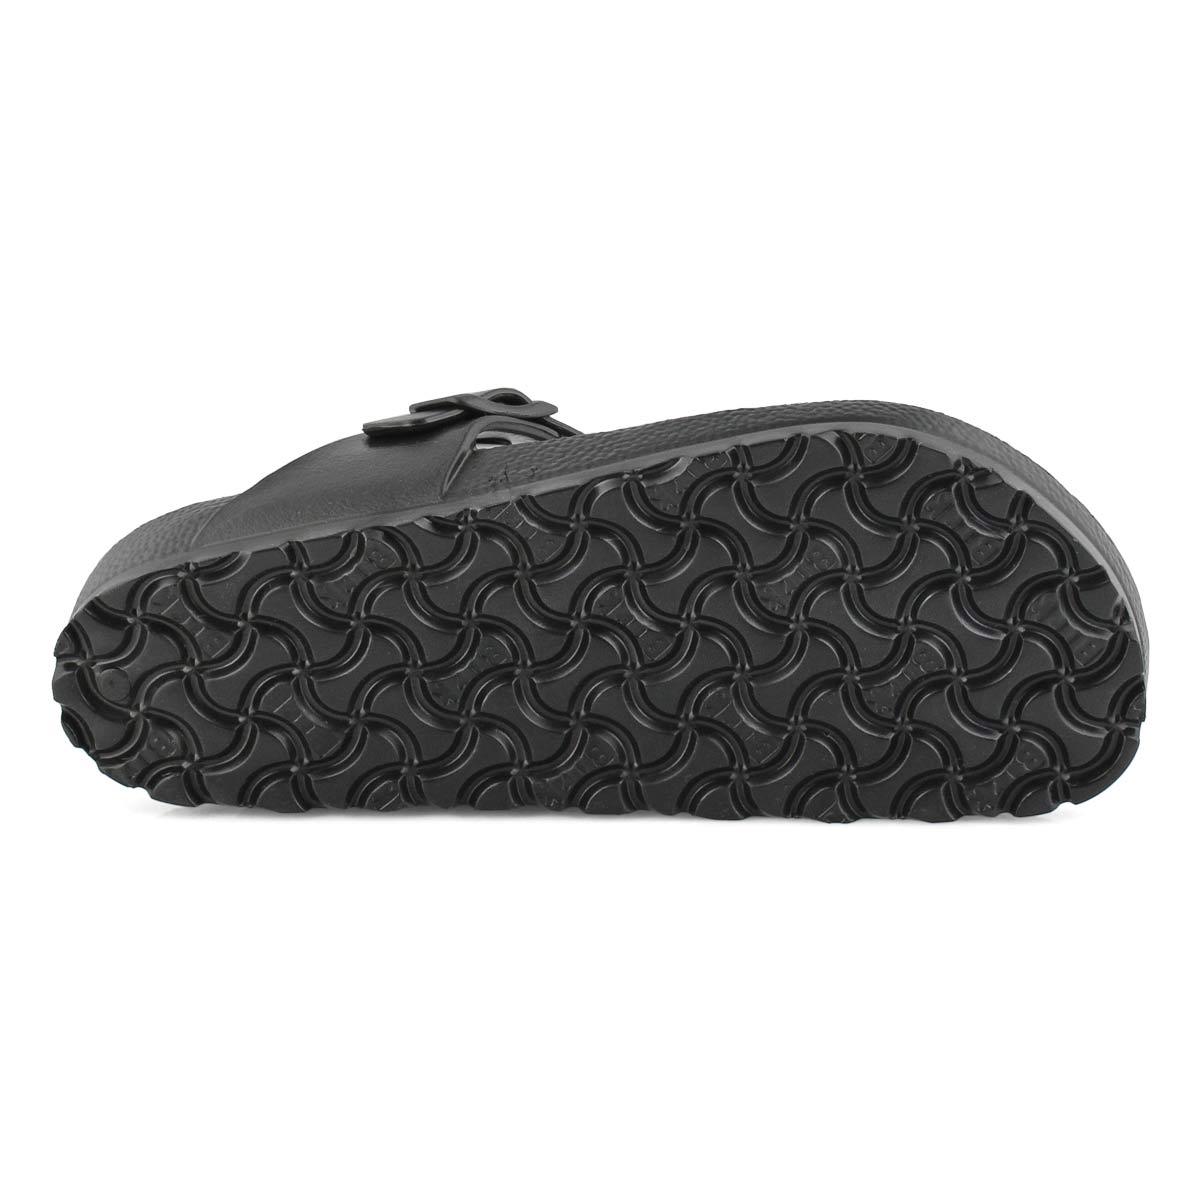 Lds Gizeh black EVA thong sandal